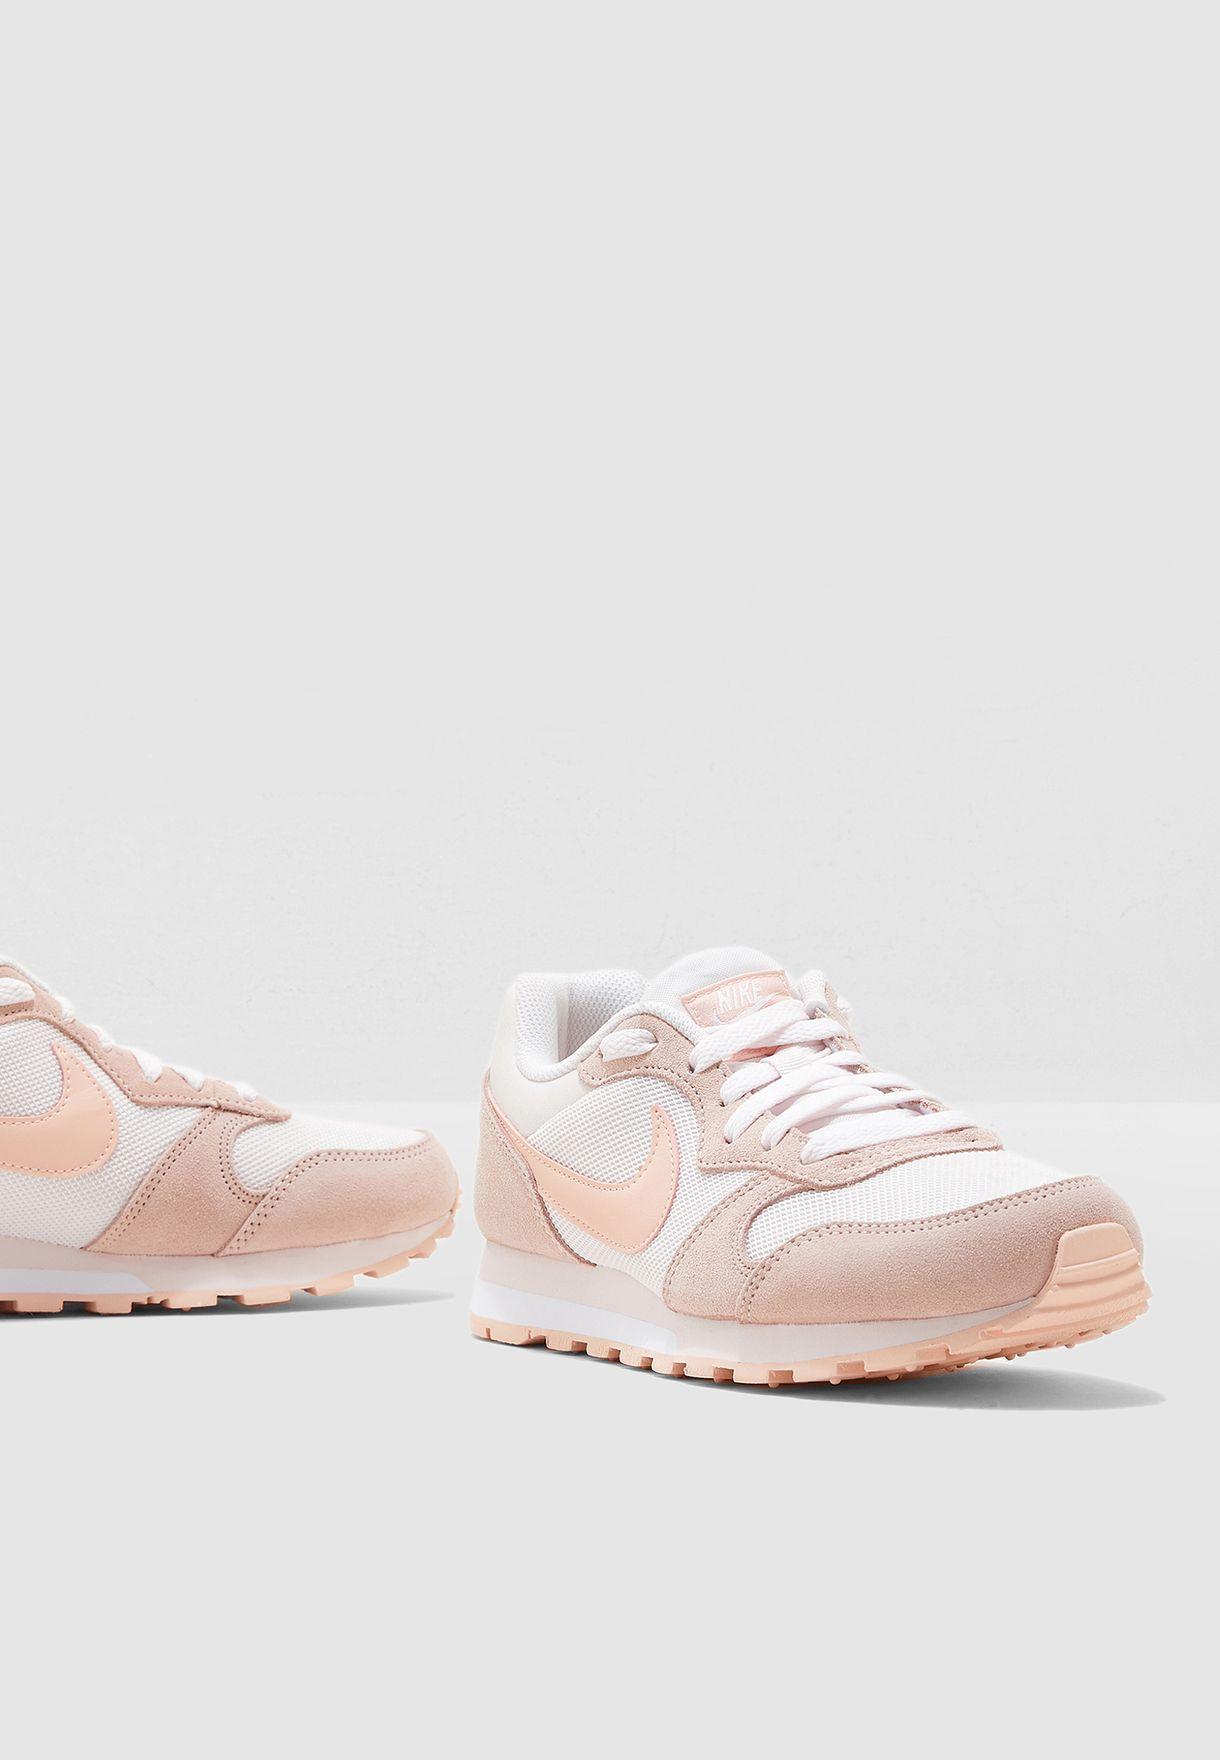 online retailer 188ef 334f9 Shop Nike pink MD Runner 2 749869-604 for Women in UAE - 72704SH50GEP